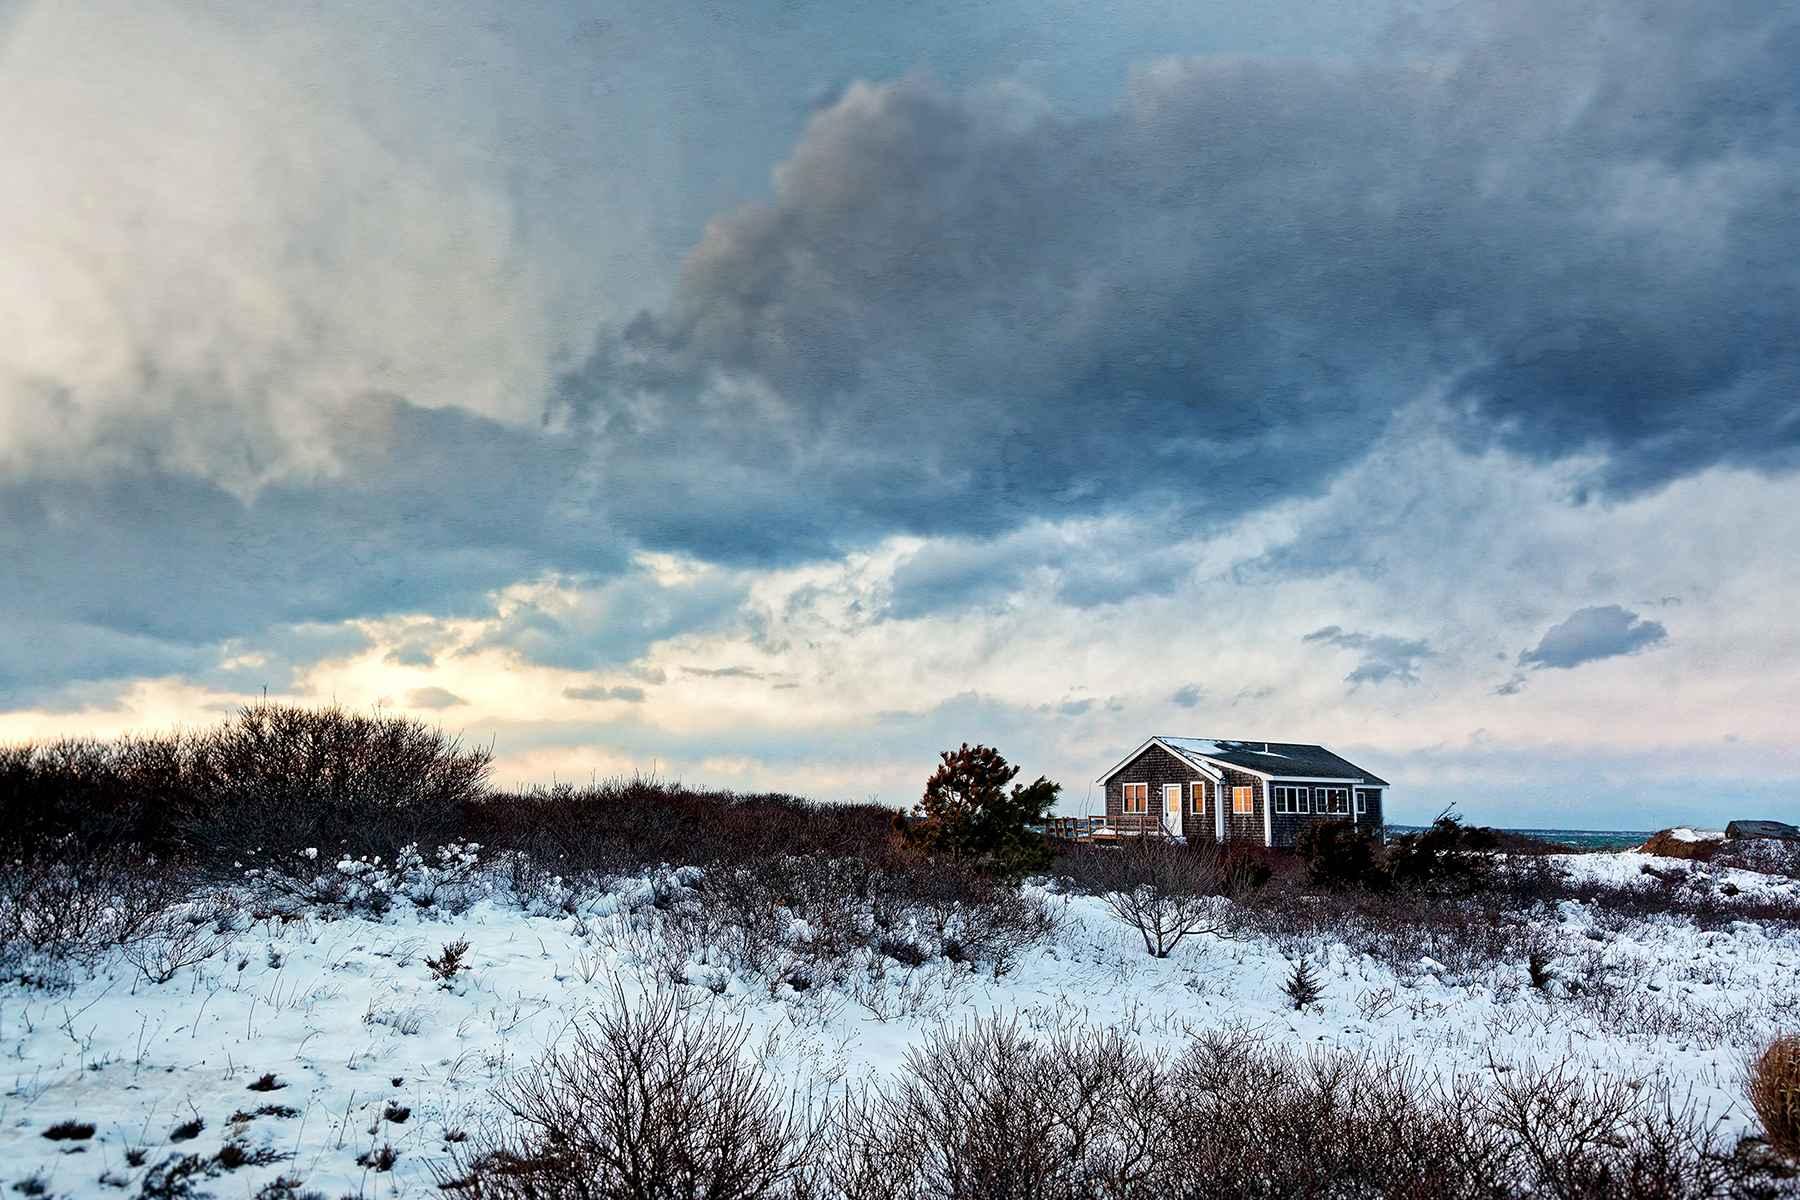 Winter Solitude, 2017 by  Michael Stimola - Masterpiece Online